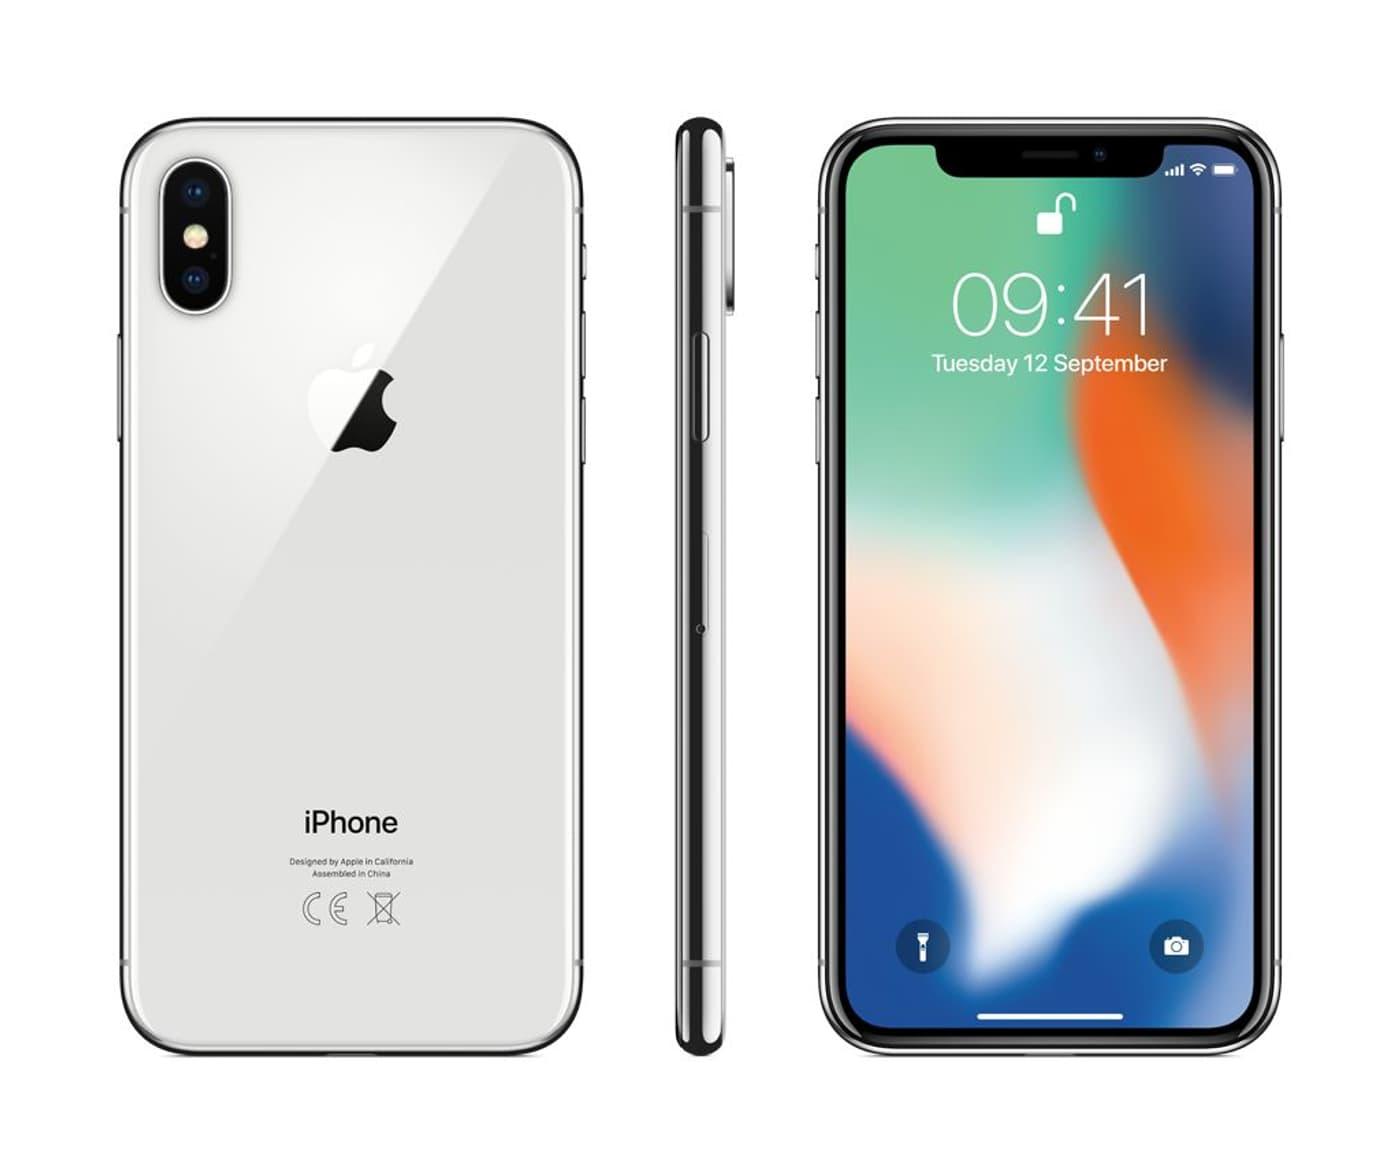 iPhone Superior, Ini 6 Smartphone Terlaris di Kuartal Awal 2018 - 1